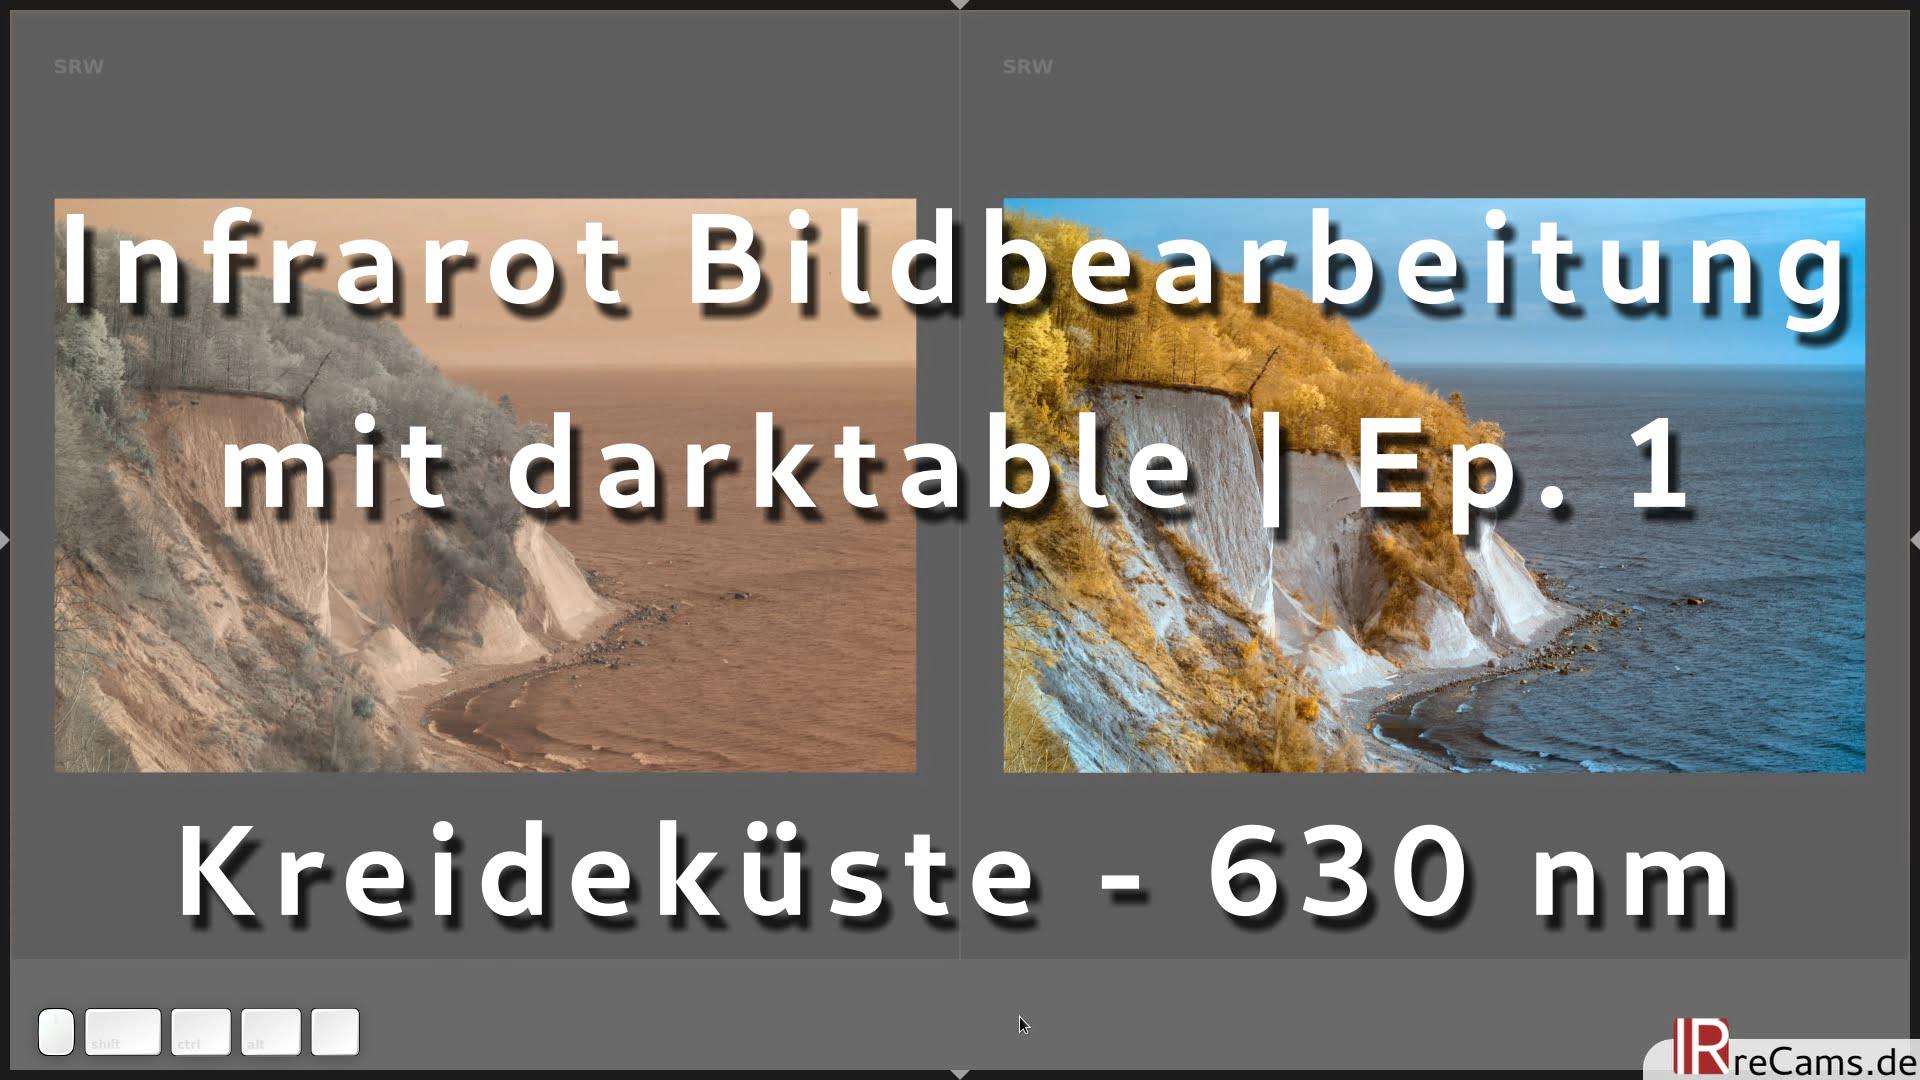 Kreideküste (630 nm Farb-IR) - Infrarot Bildbearbeitung mit darktable | Ep. 1